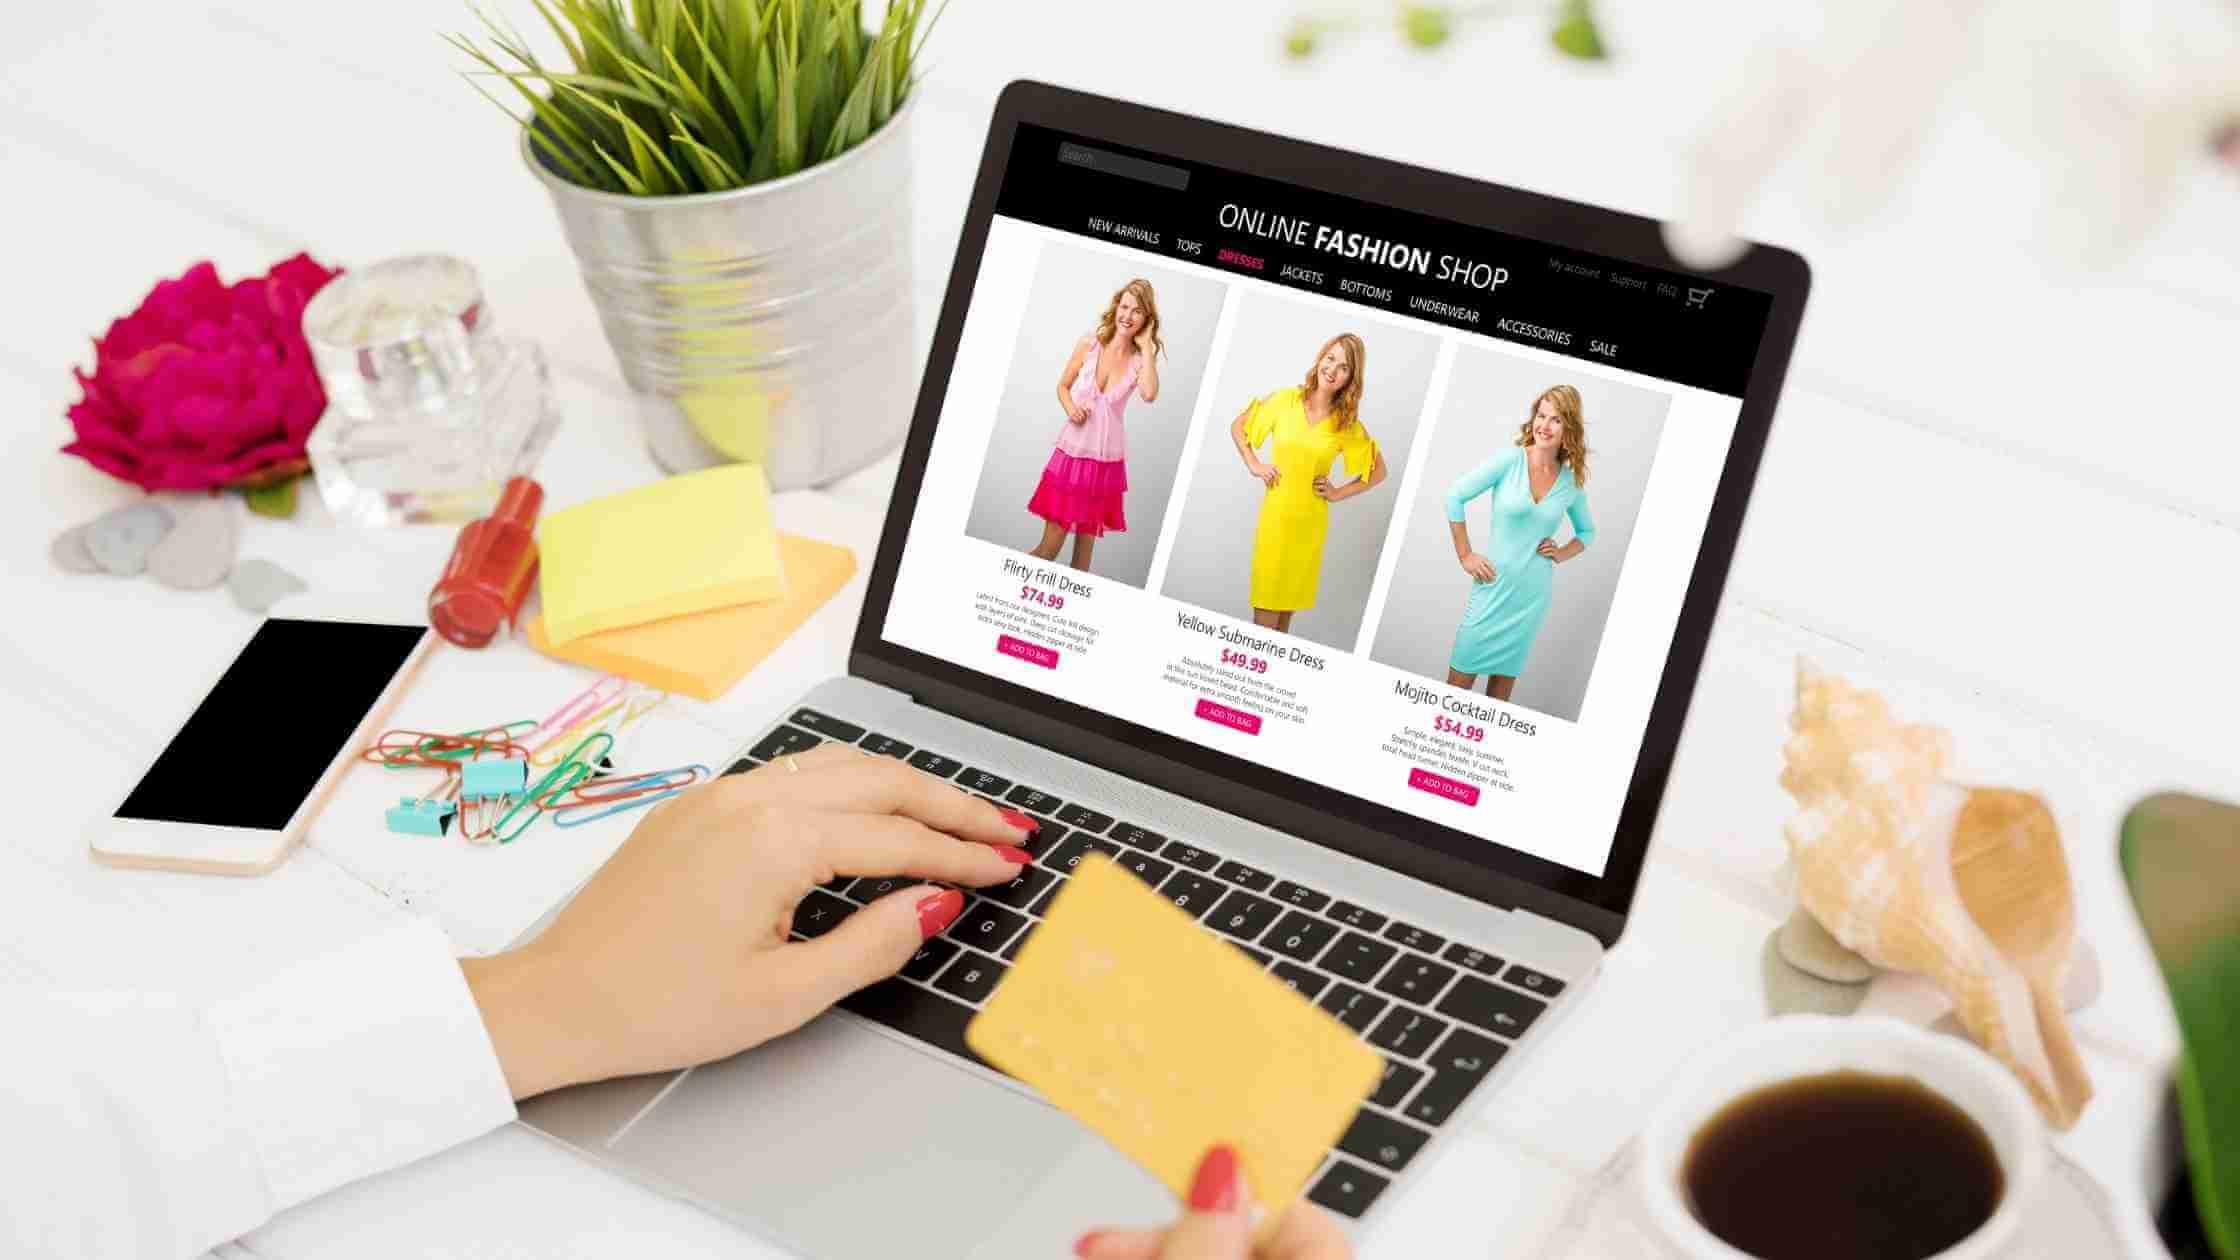 Design tips to boost online uniform sales